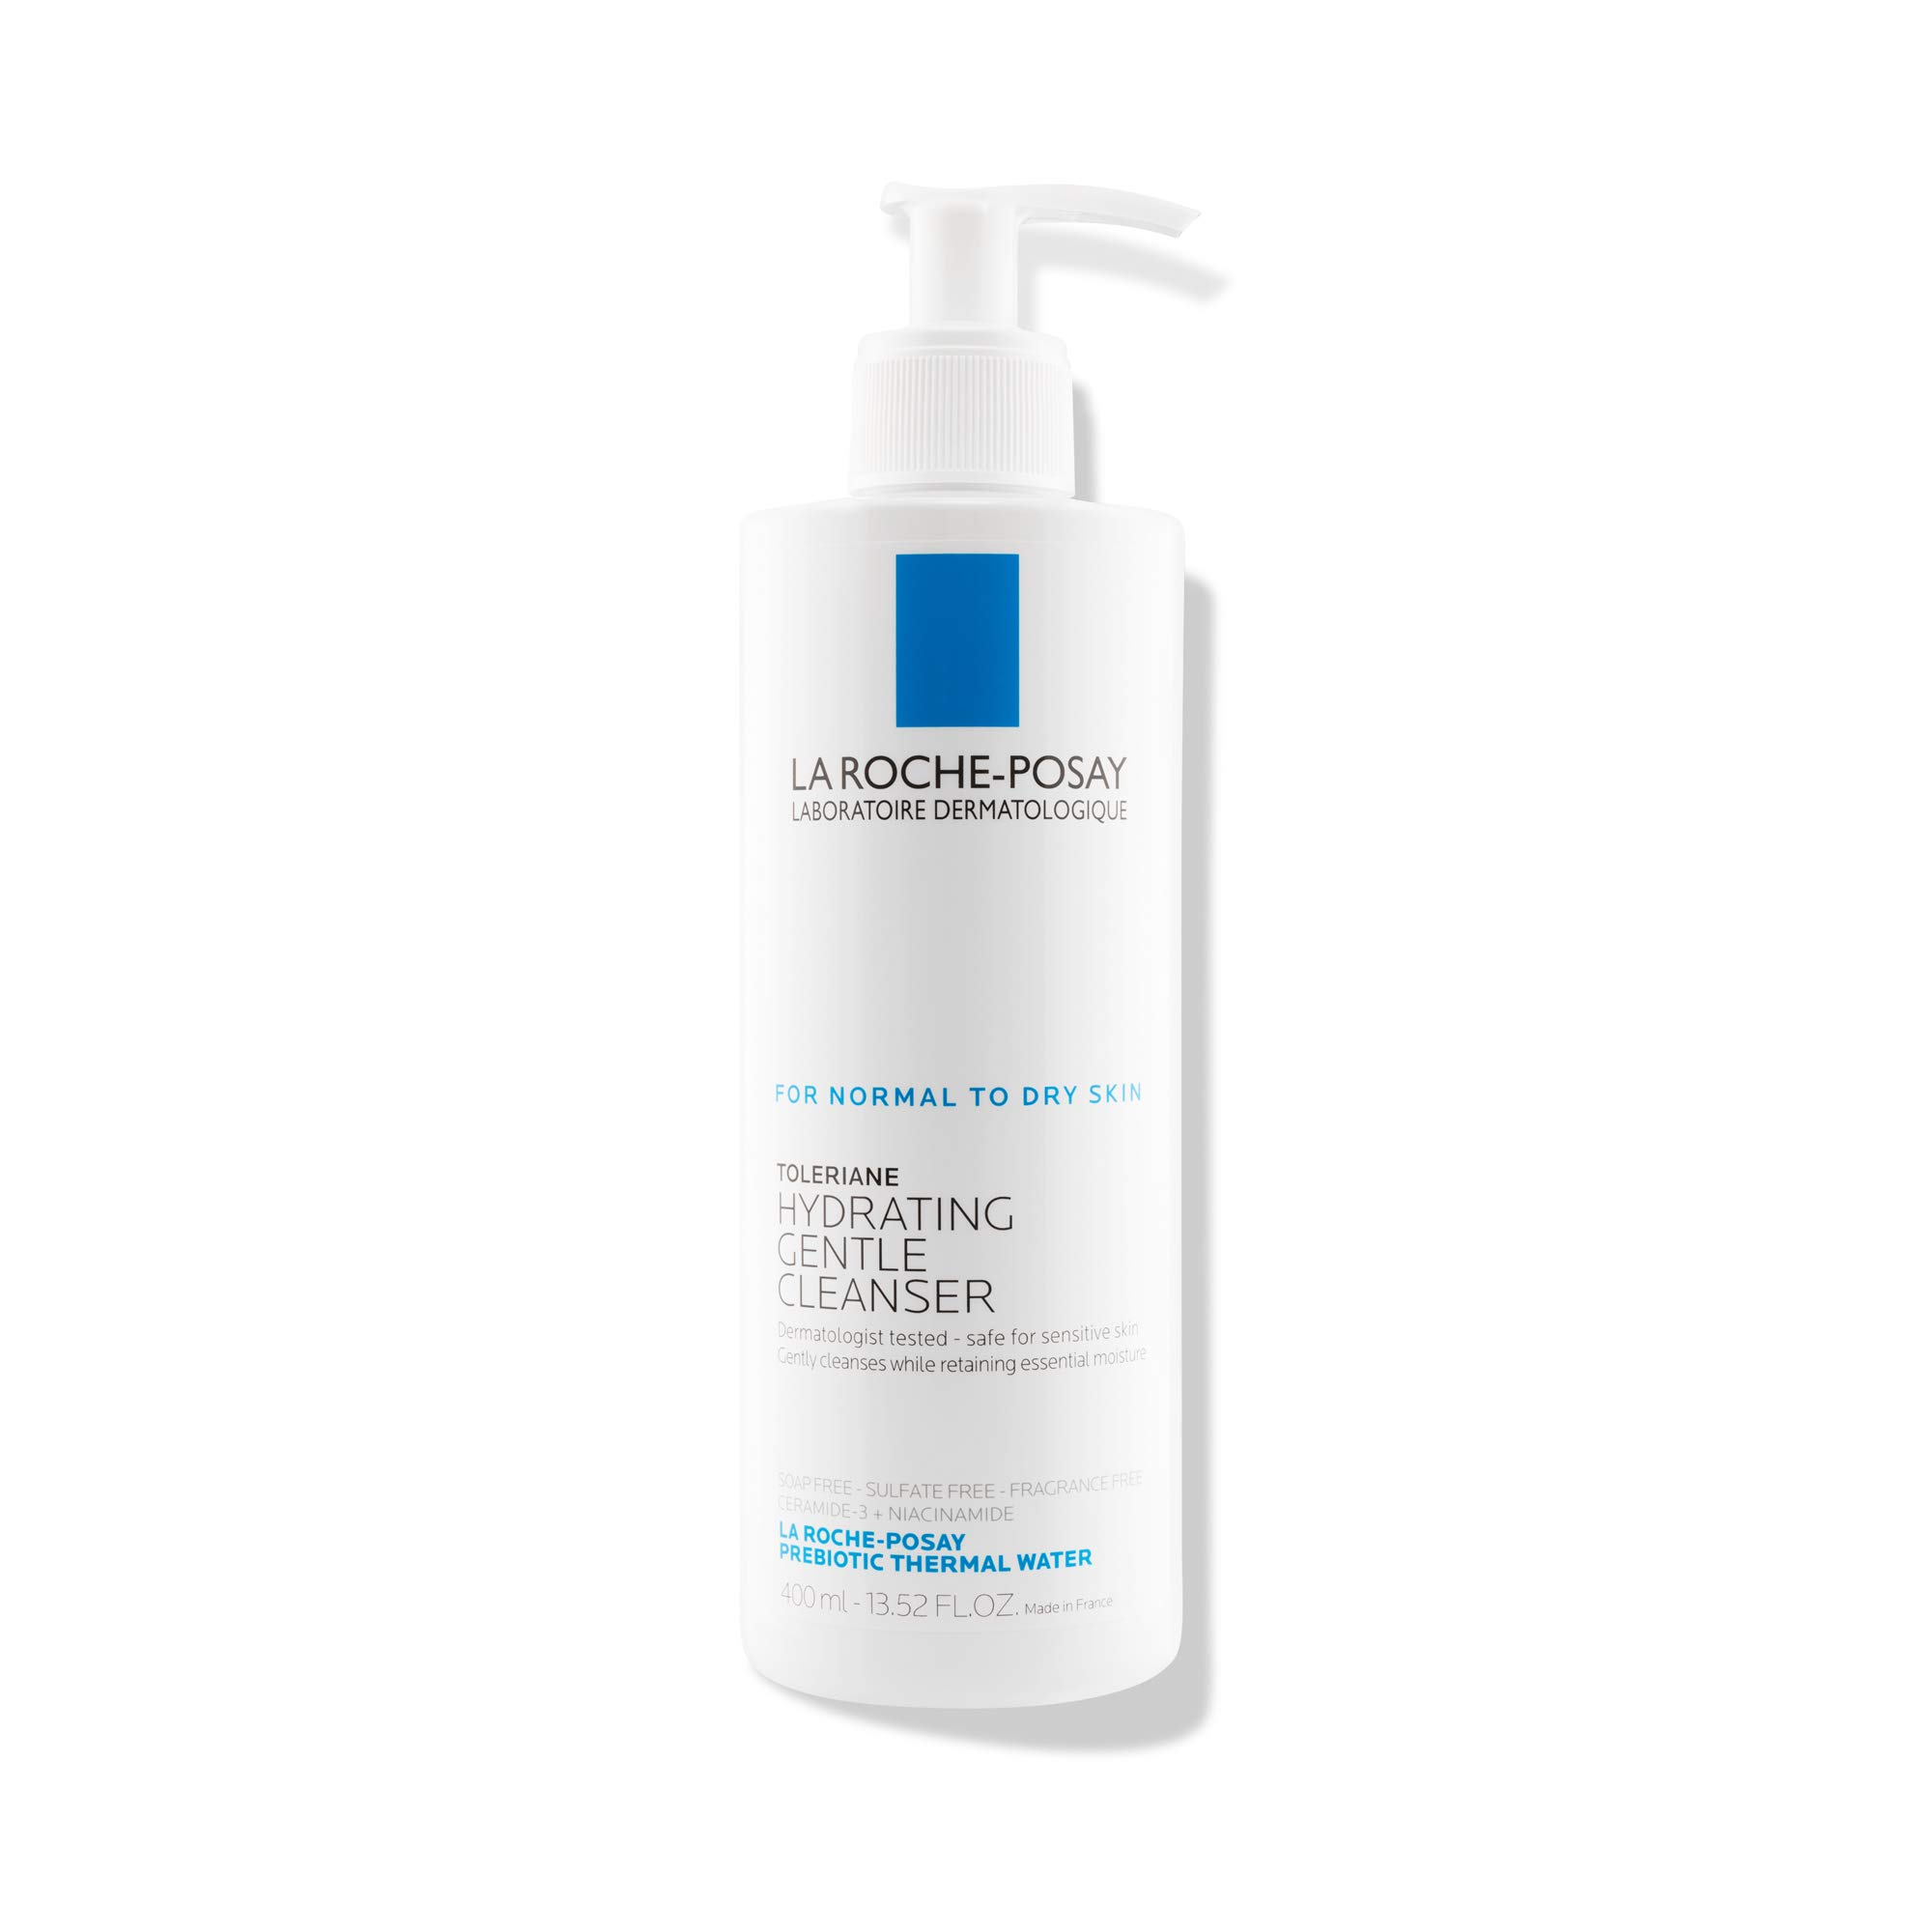 Clarisonic Mia Smart + La Roche Posay Amazon Exclusive Set for Oily, Shiny, or Dry, Sensitive Skin by Clarisonic (Image #4)